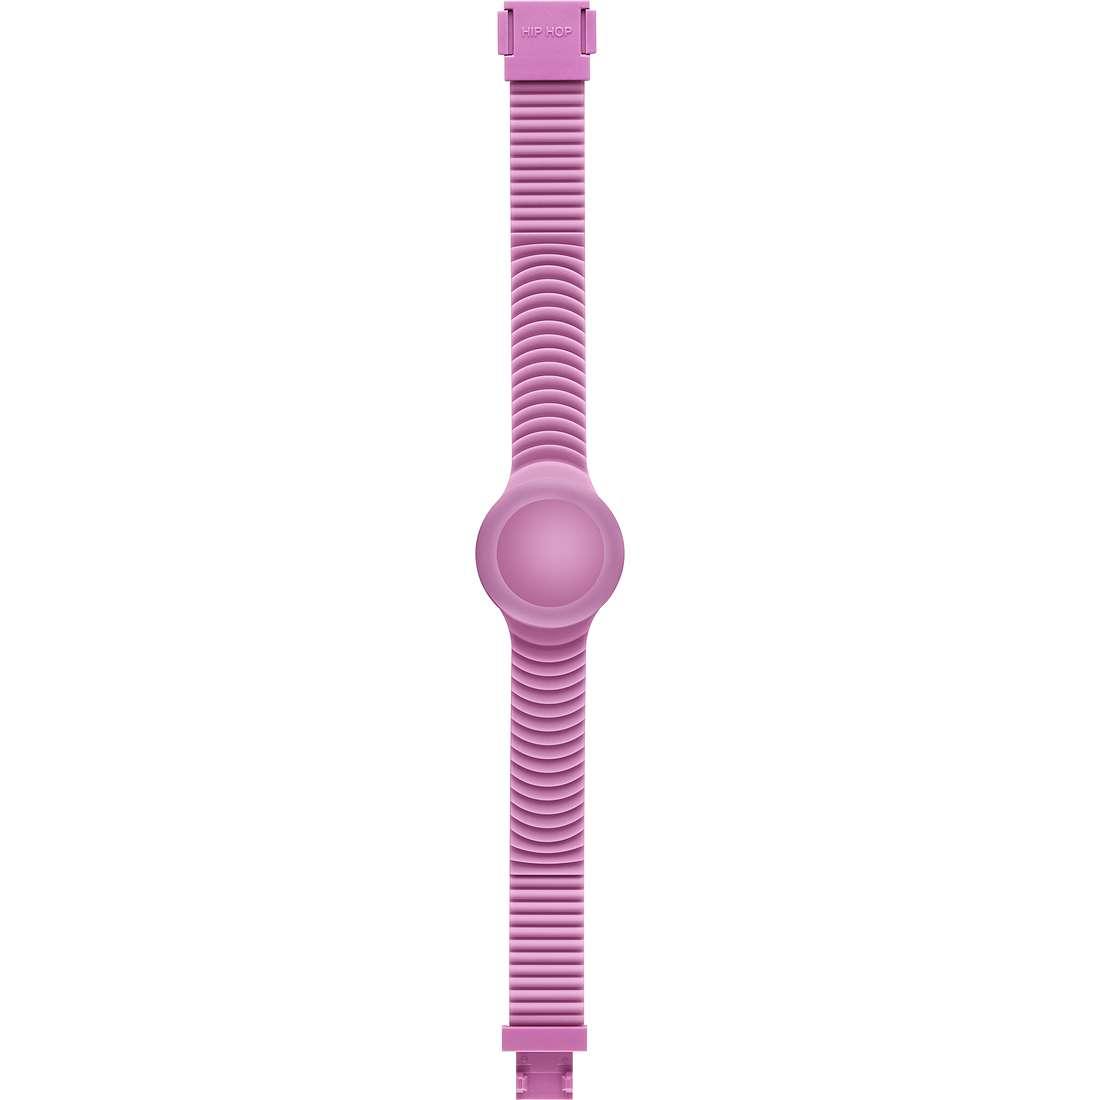 orologio accessorio donna Hip Hop Sensoriality HBU0517